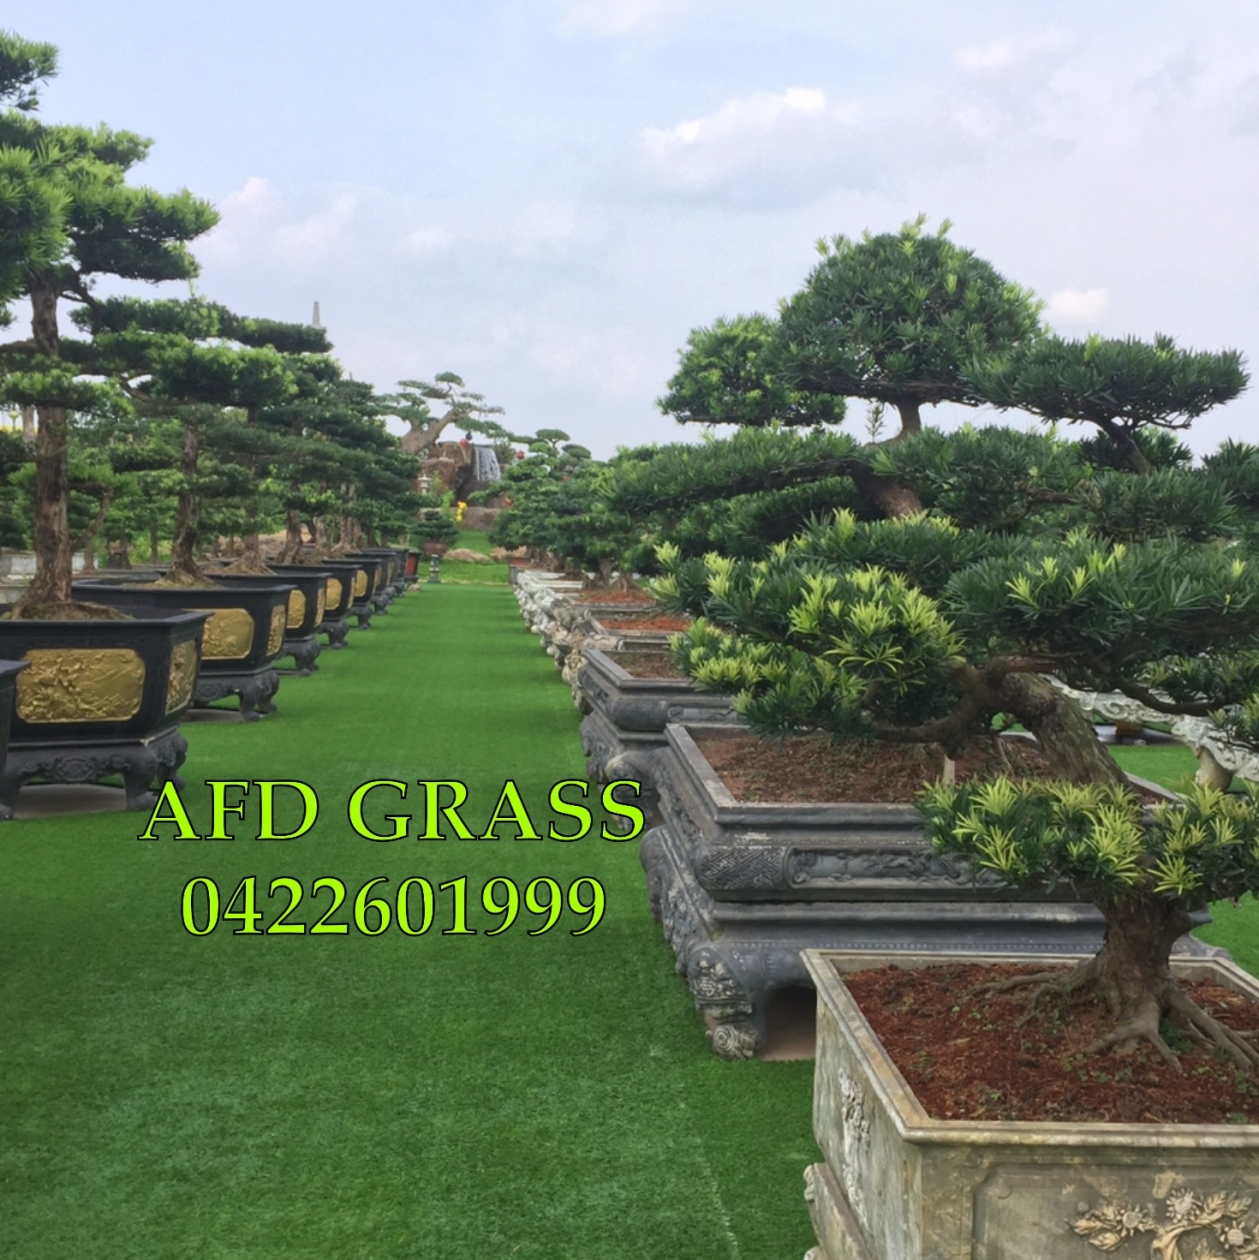 CoNG TRiNH SoNG CoNG THaI NGUYeN _uWm32 → Công ty AFD grass